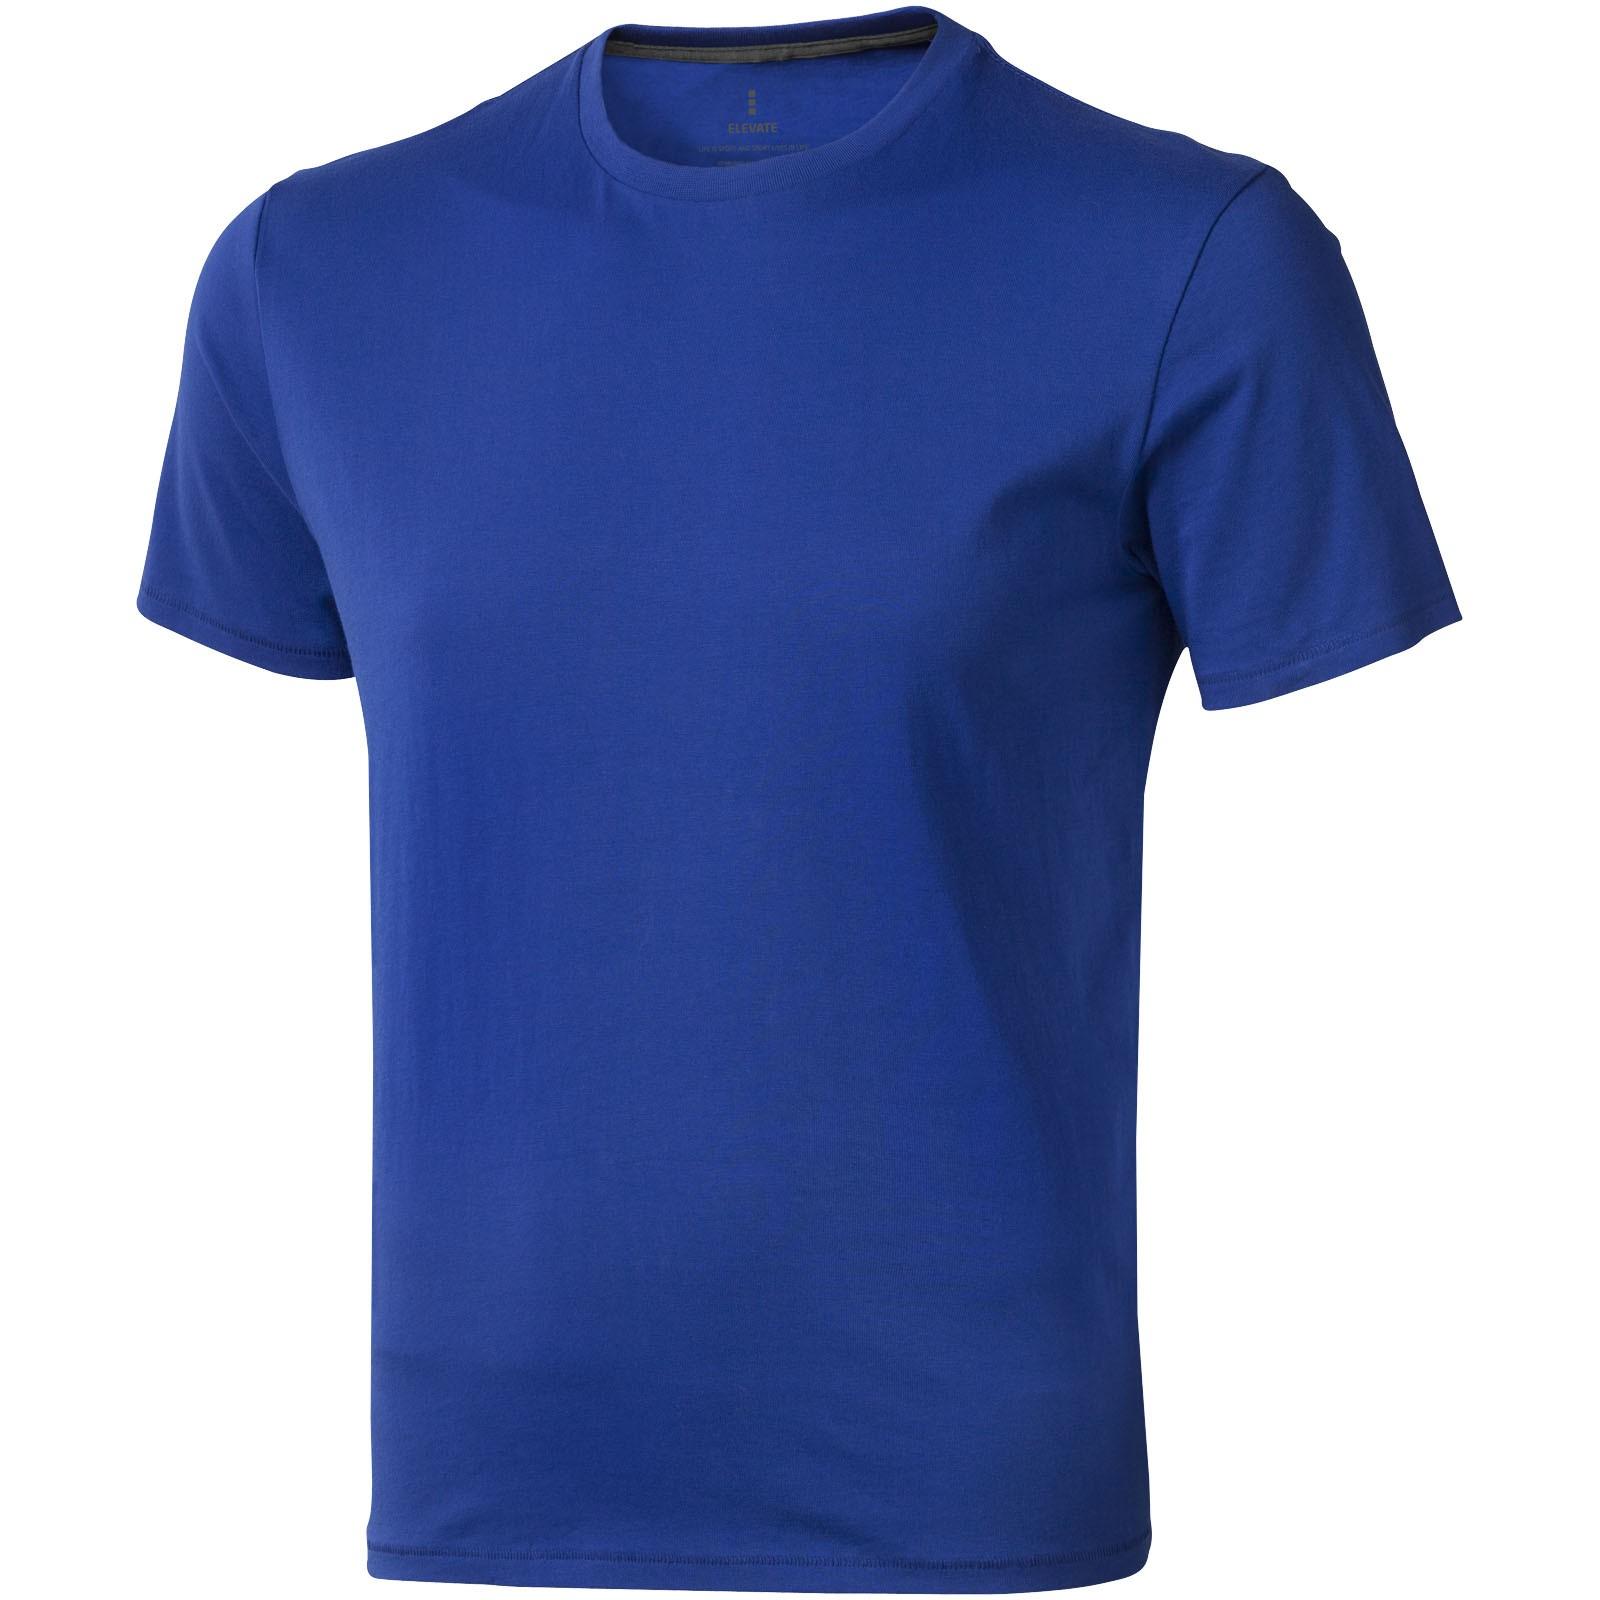 Nanaimo short sleeve men's t-shirt - Blue / XS